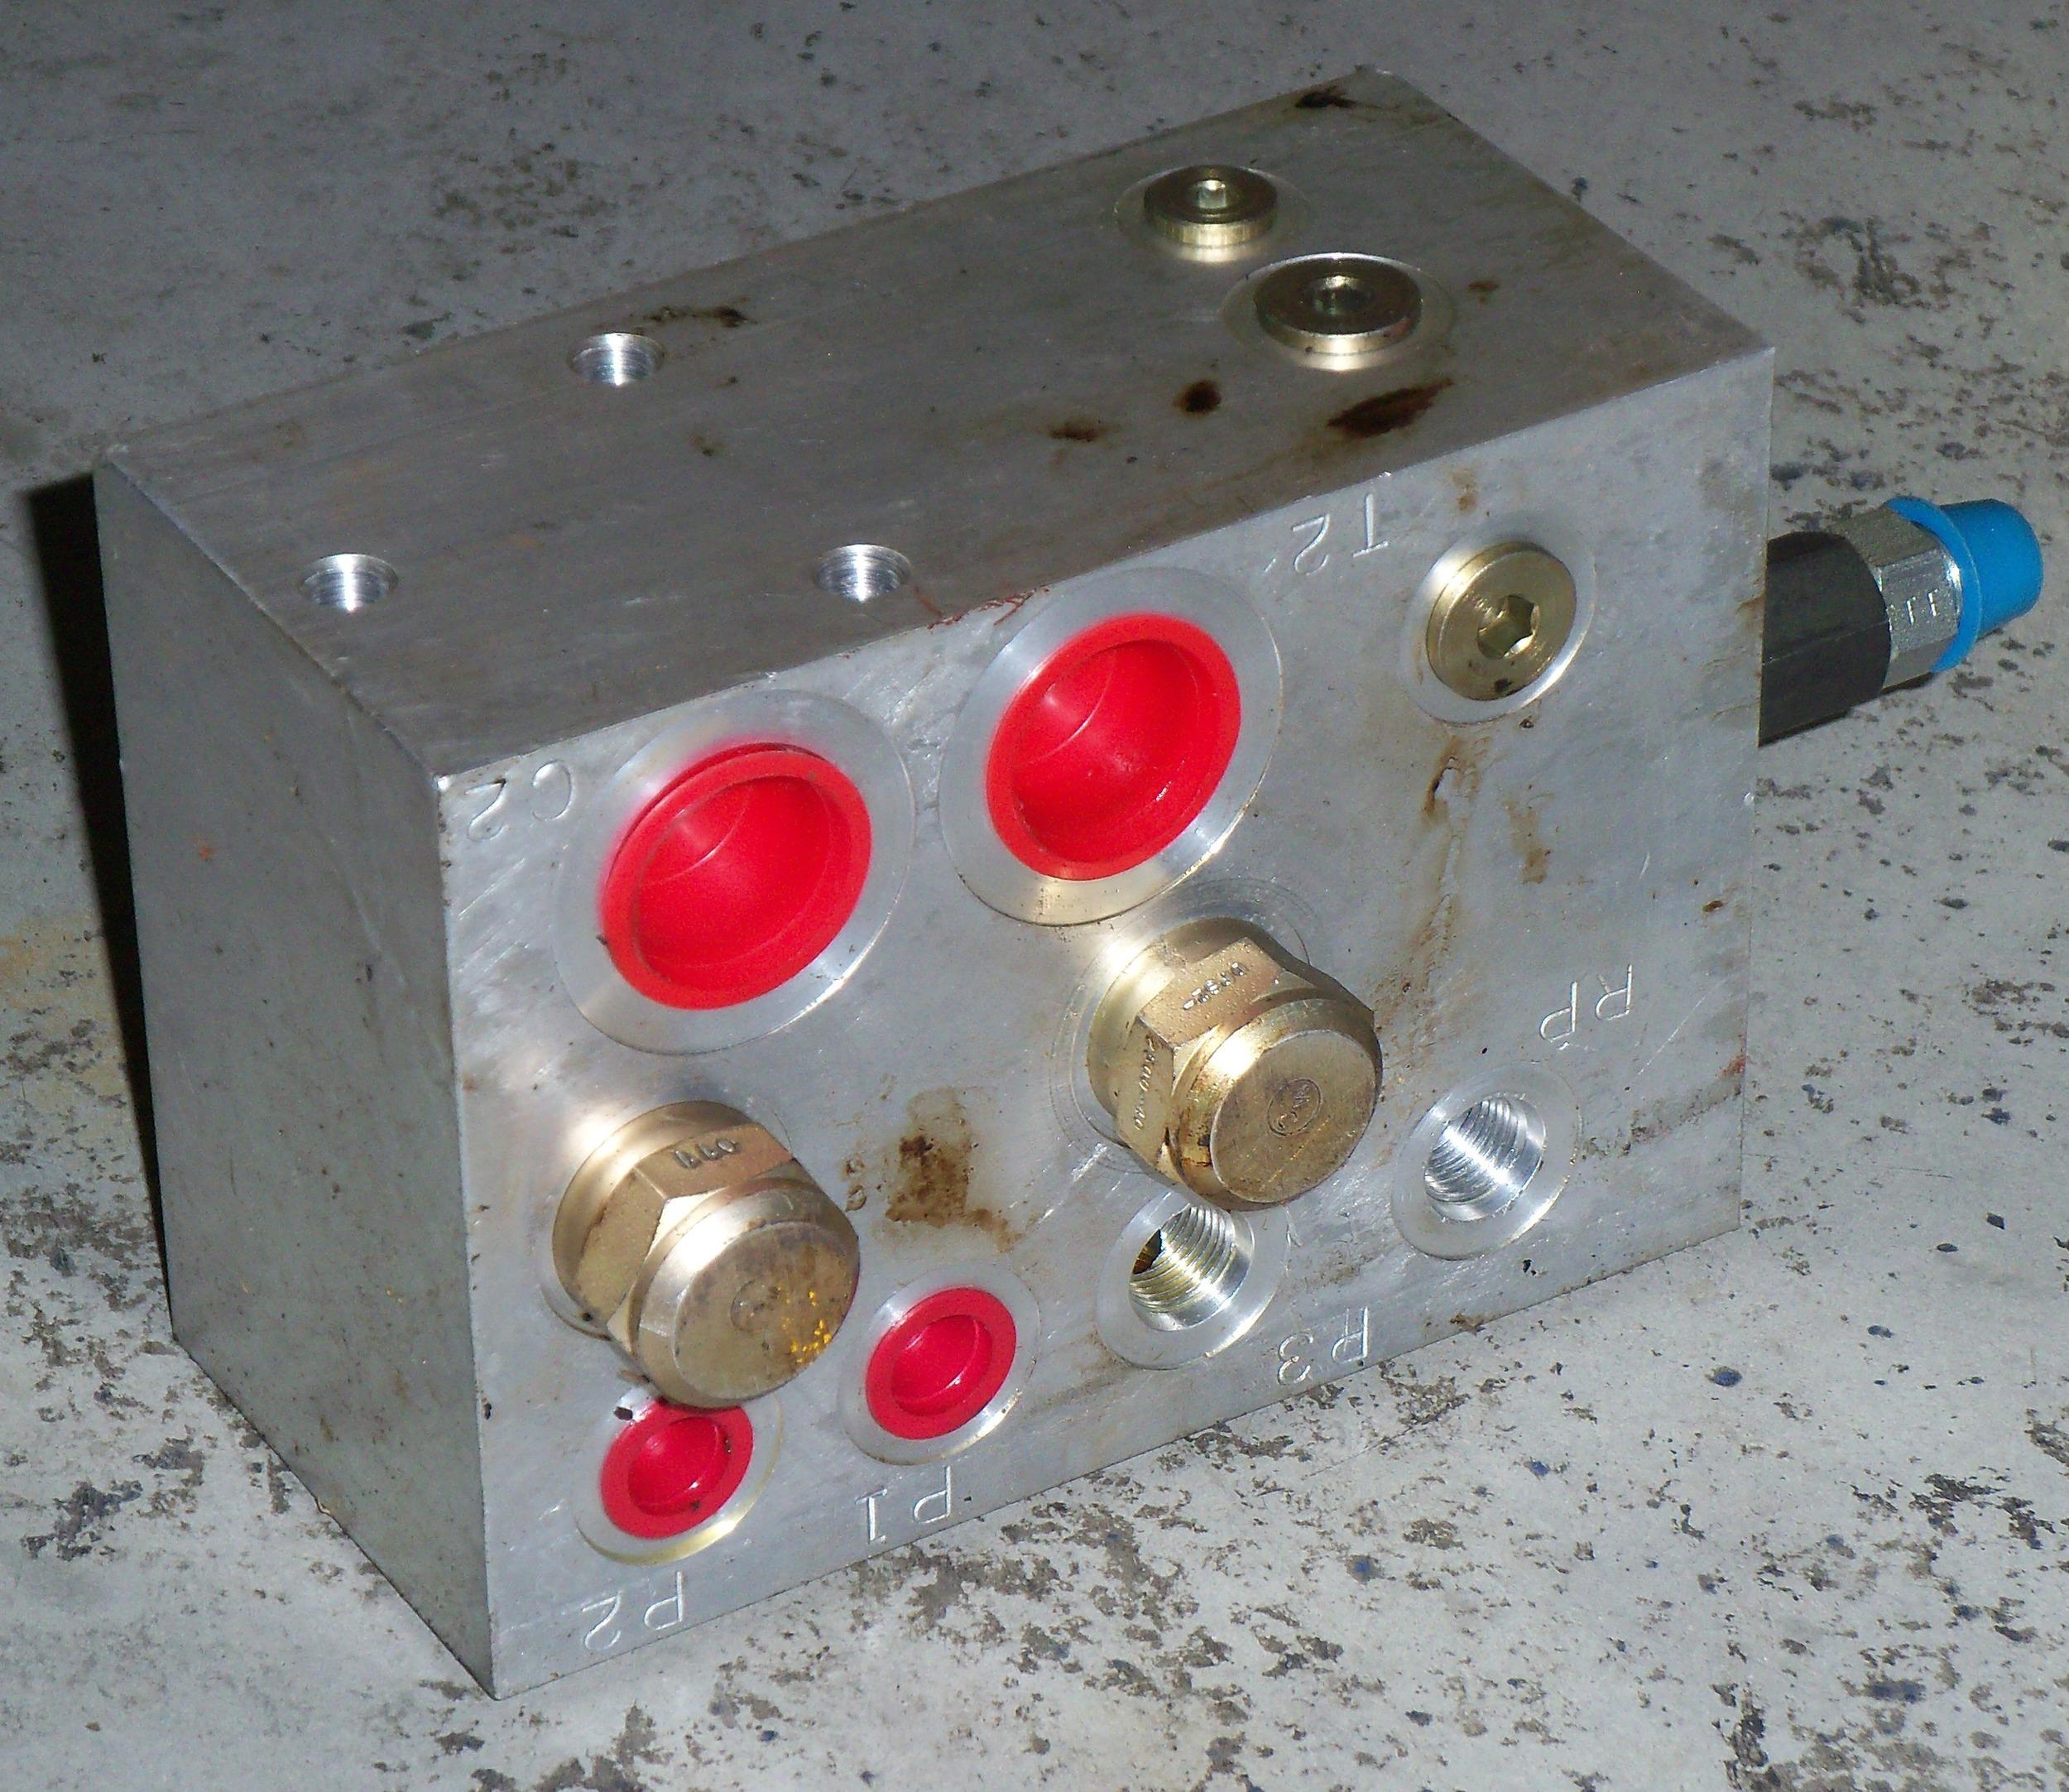 P89984-1.jpg